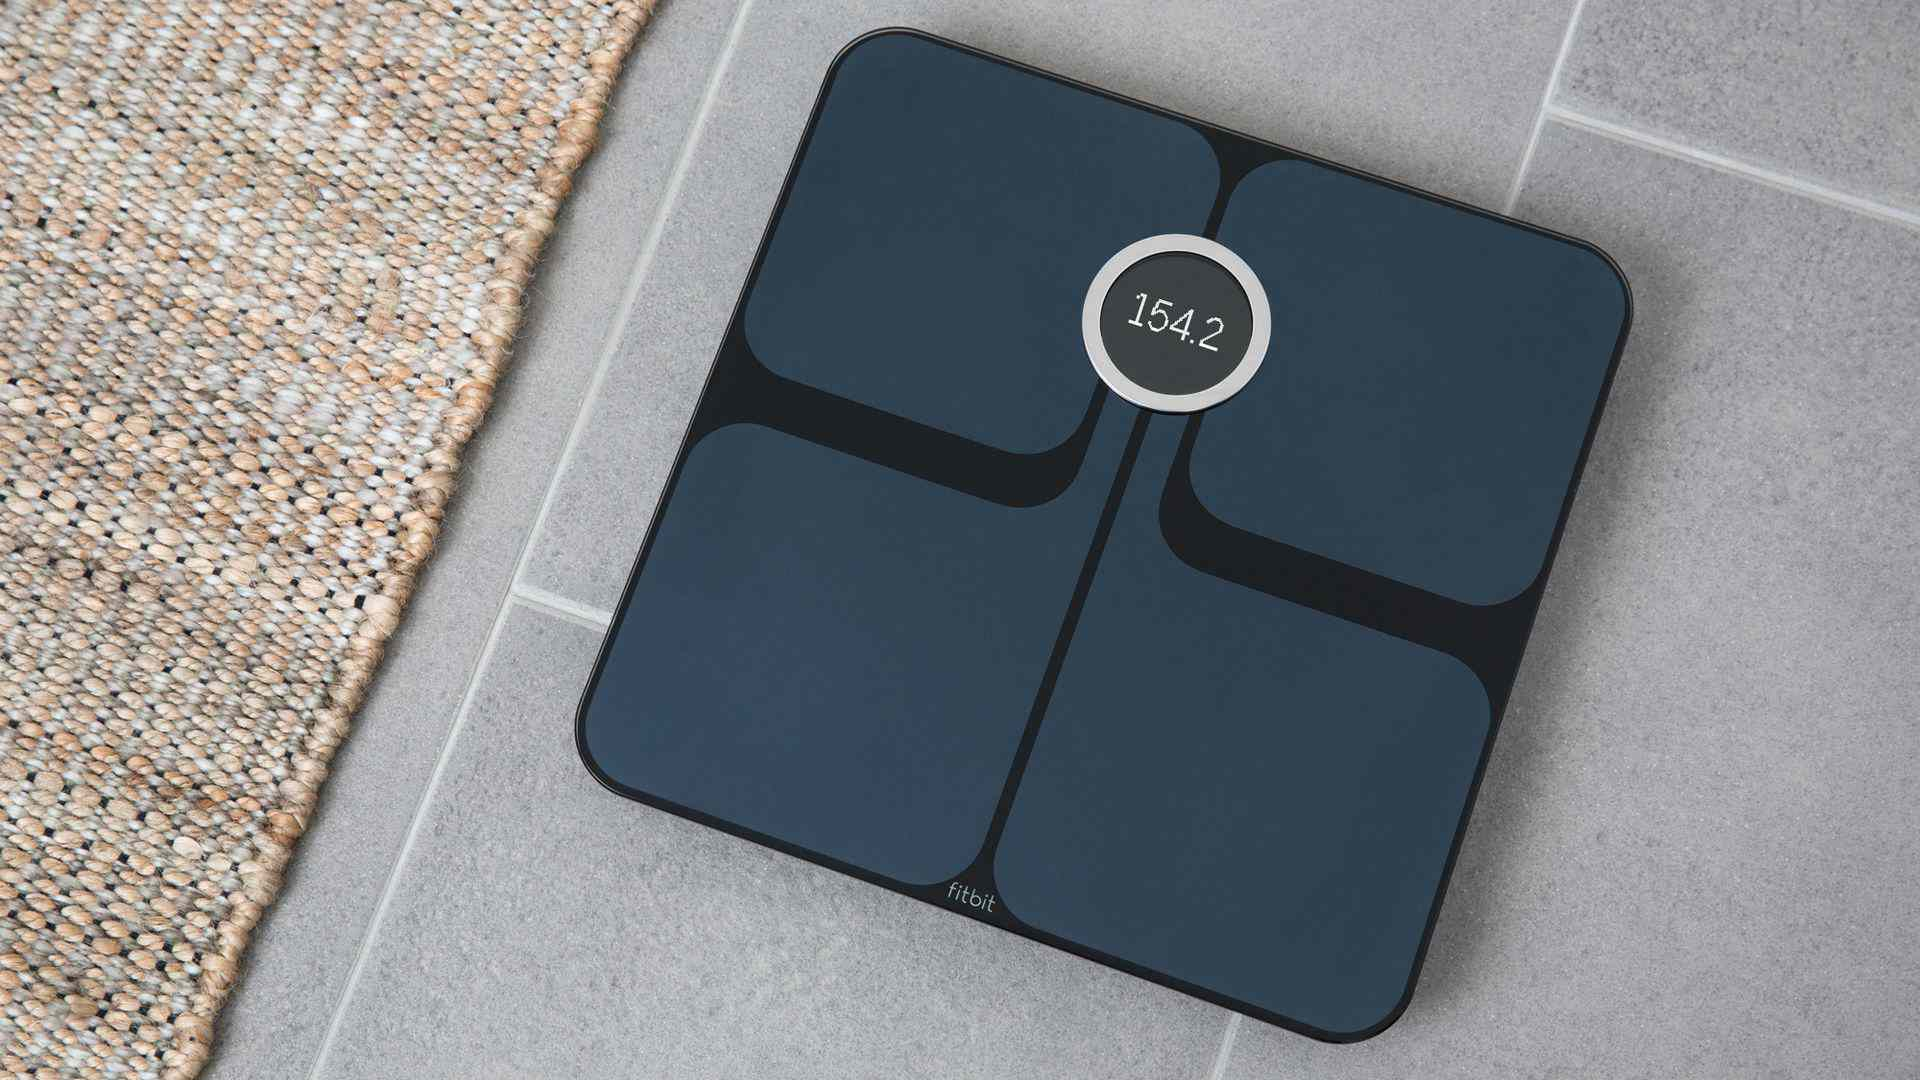 Black Fitbit Aria 2 Smart Scale